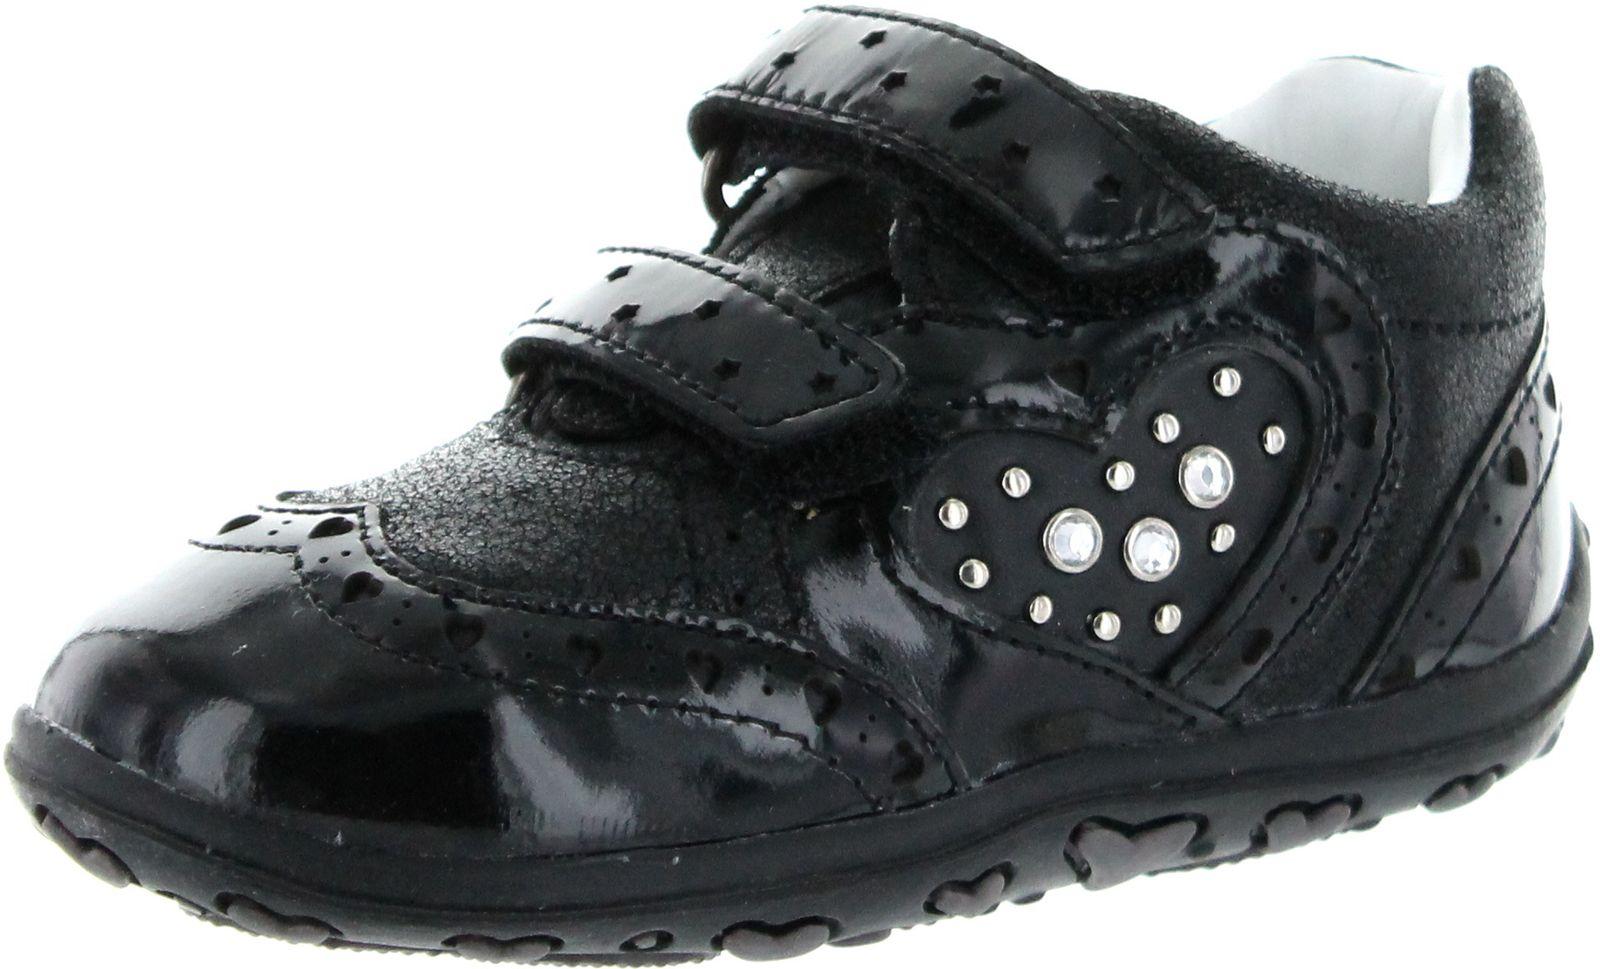 Geox Cbubble29 Sneaker at Sears.com